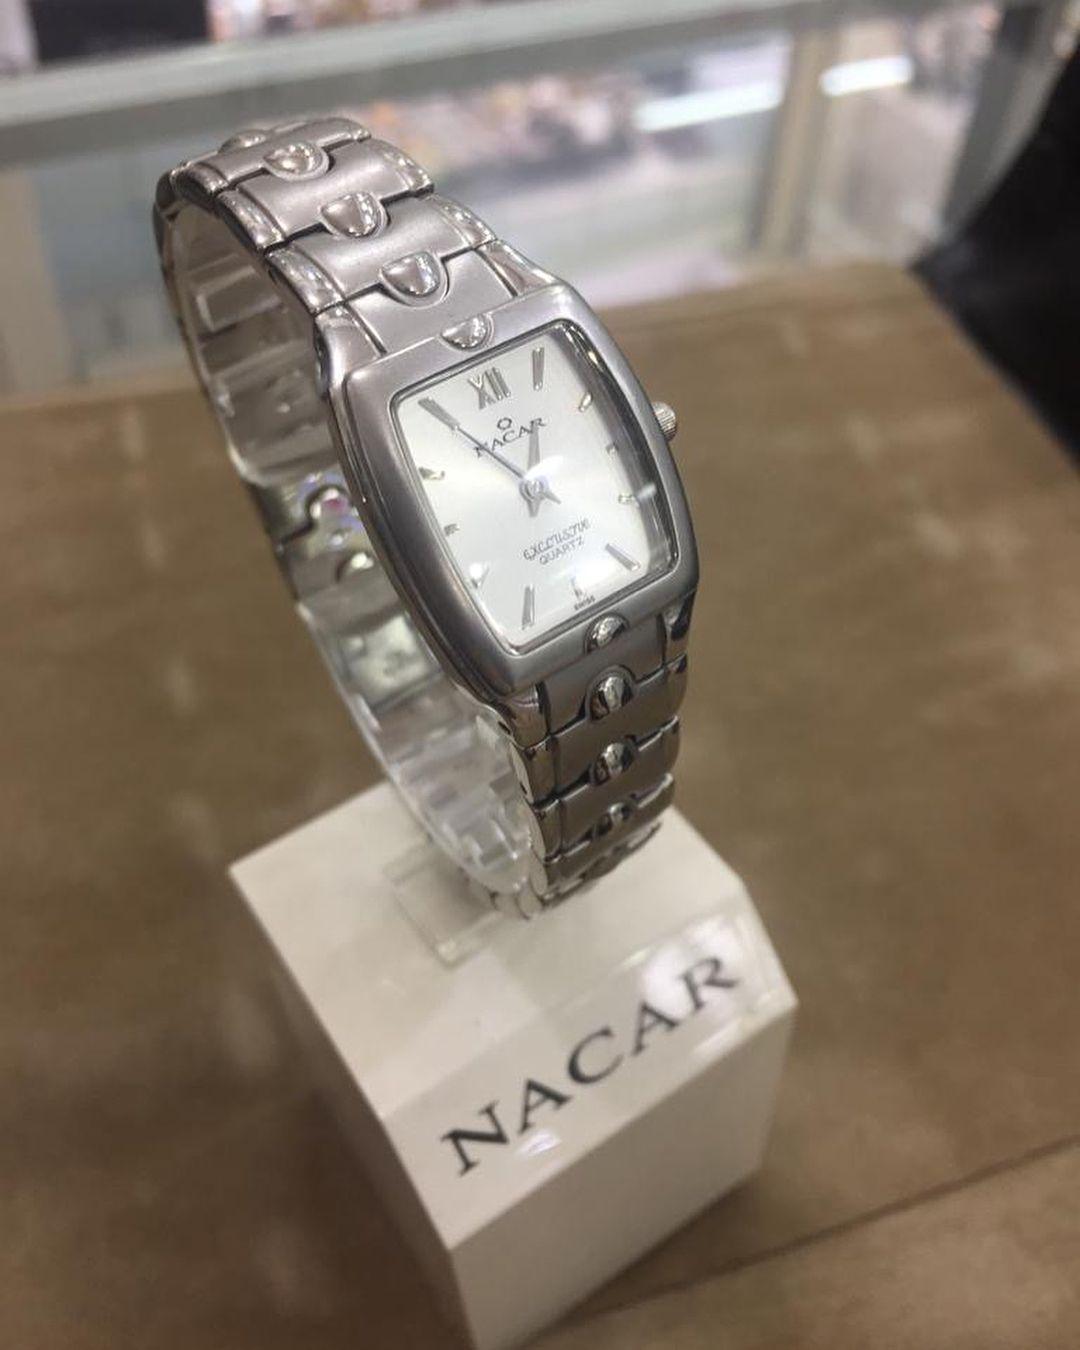 Nacar Celik Bayan Saati Nacarsaat Vintagesaat Vintagewatch Saat Saatler Saatmodelleri Romanson Watch Retrowatch Seik In 2020 Accessories Square Watch Fashion